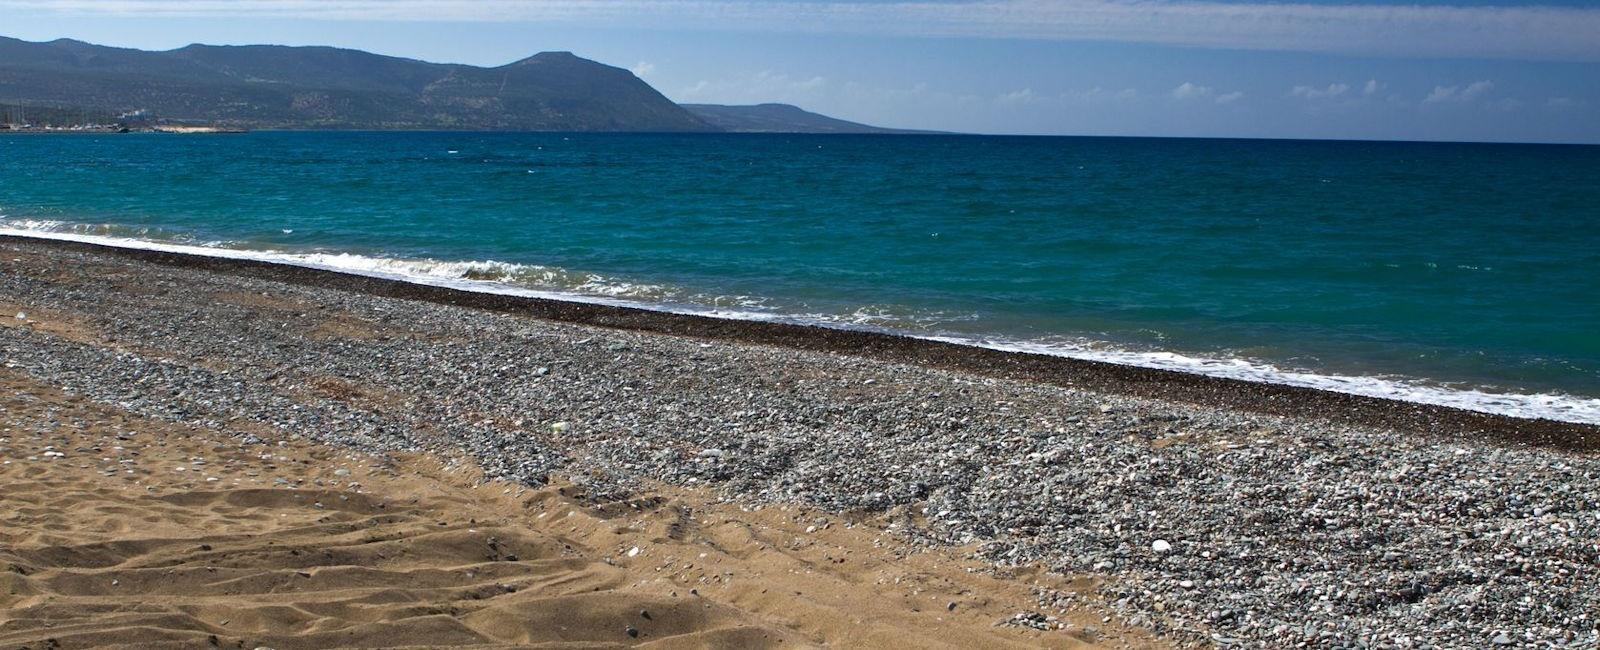 polis beach, cyrpus